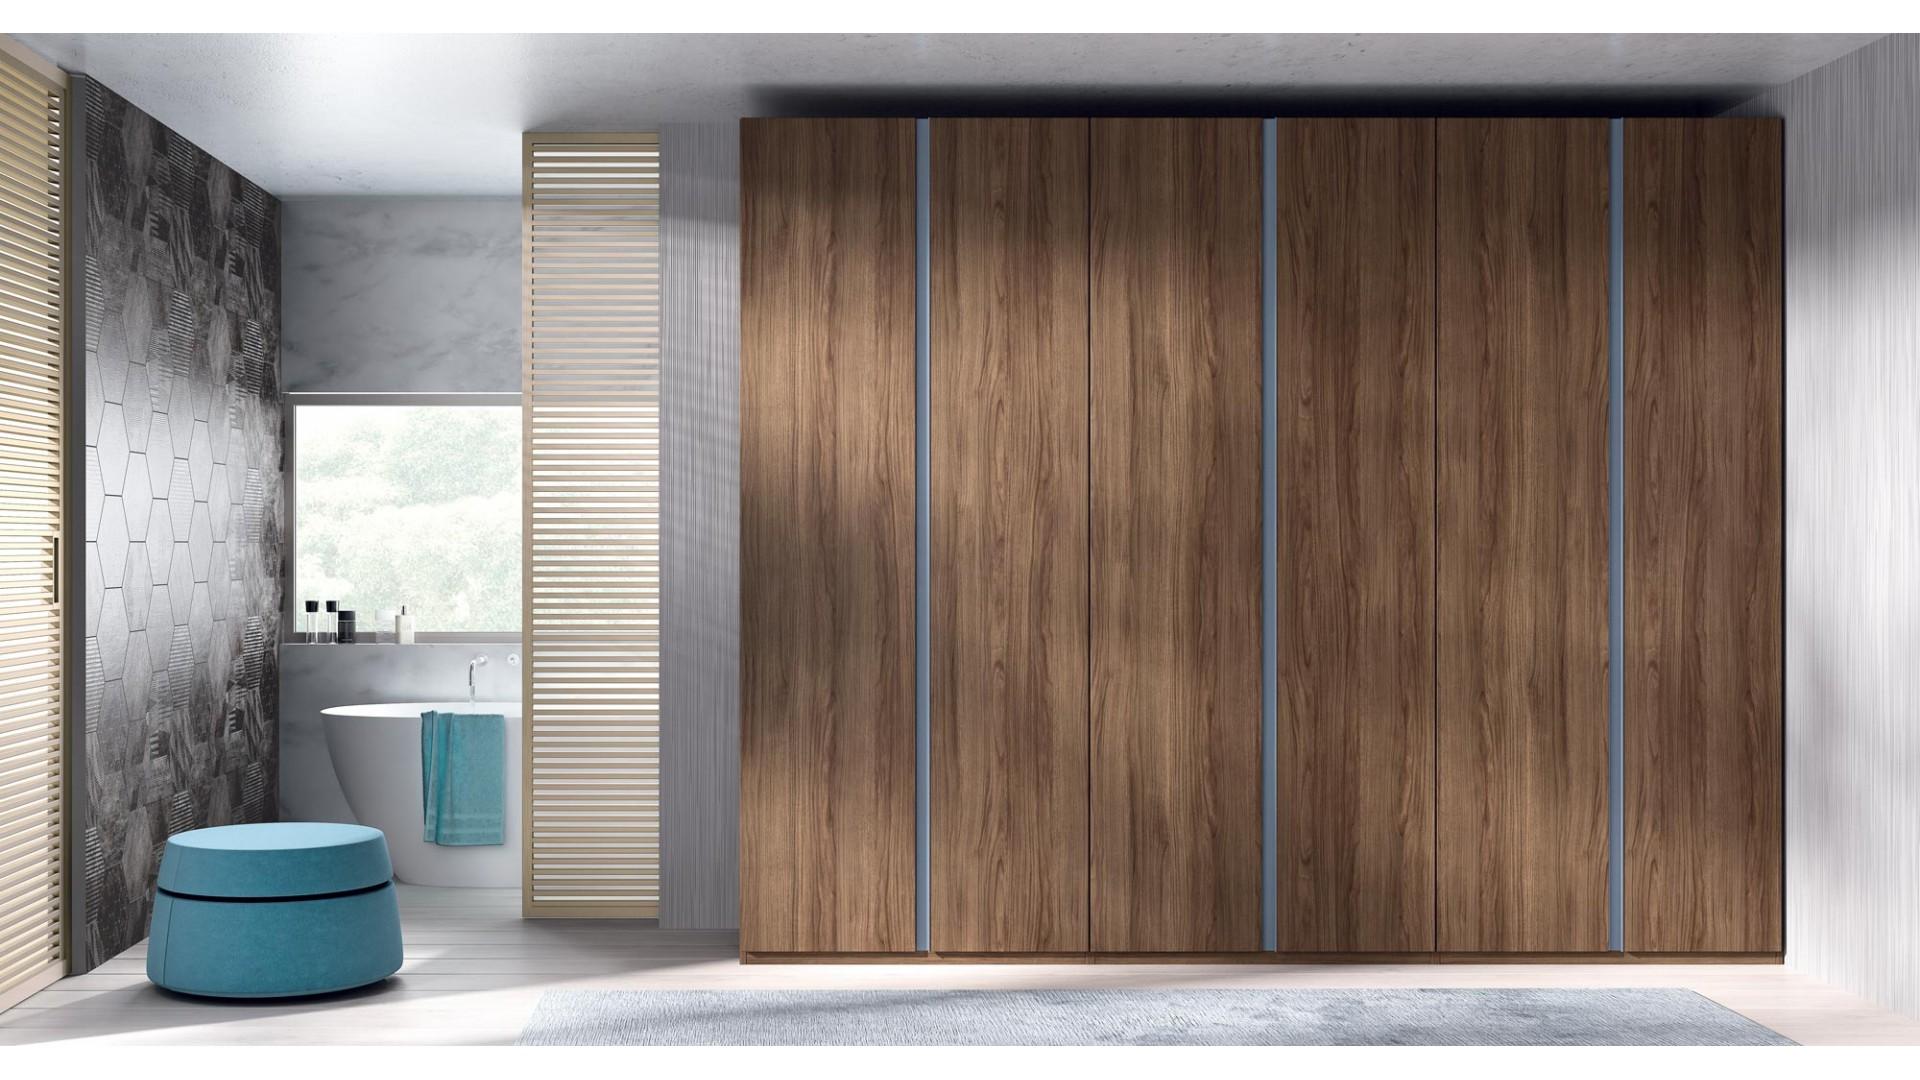 Armoire dressing 6 portes battantes PERSONNALISABLE COSMO50 - GLICERIO